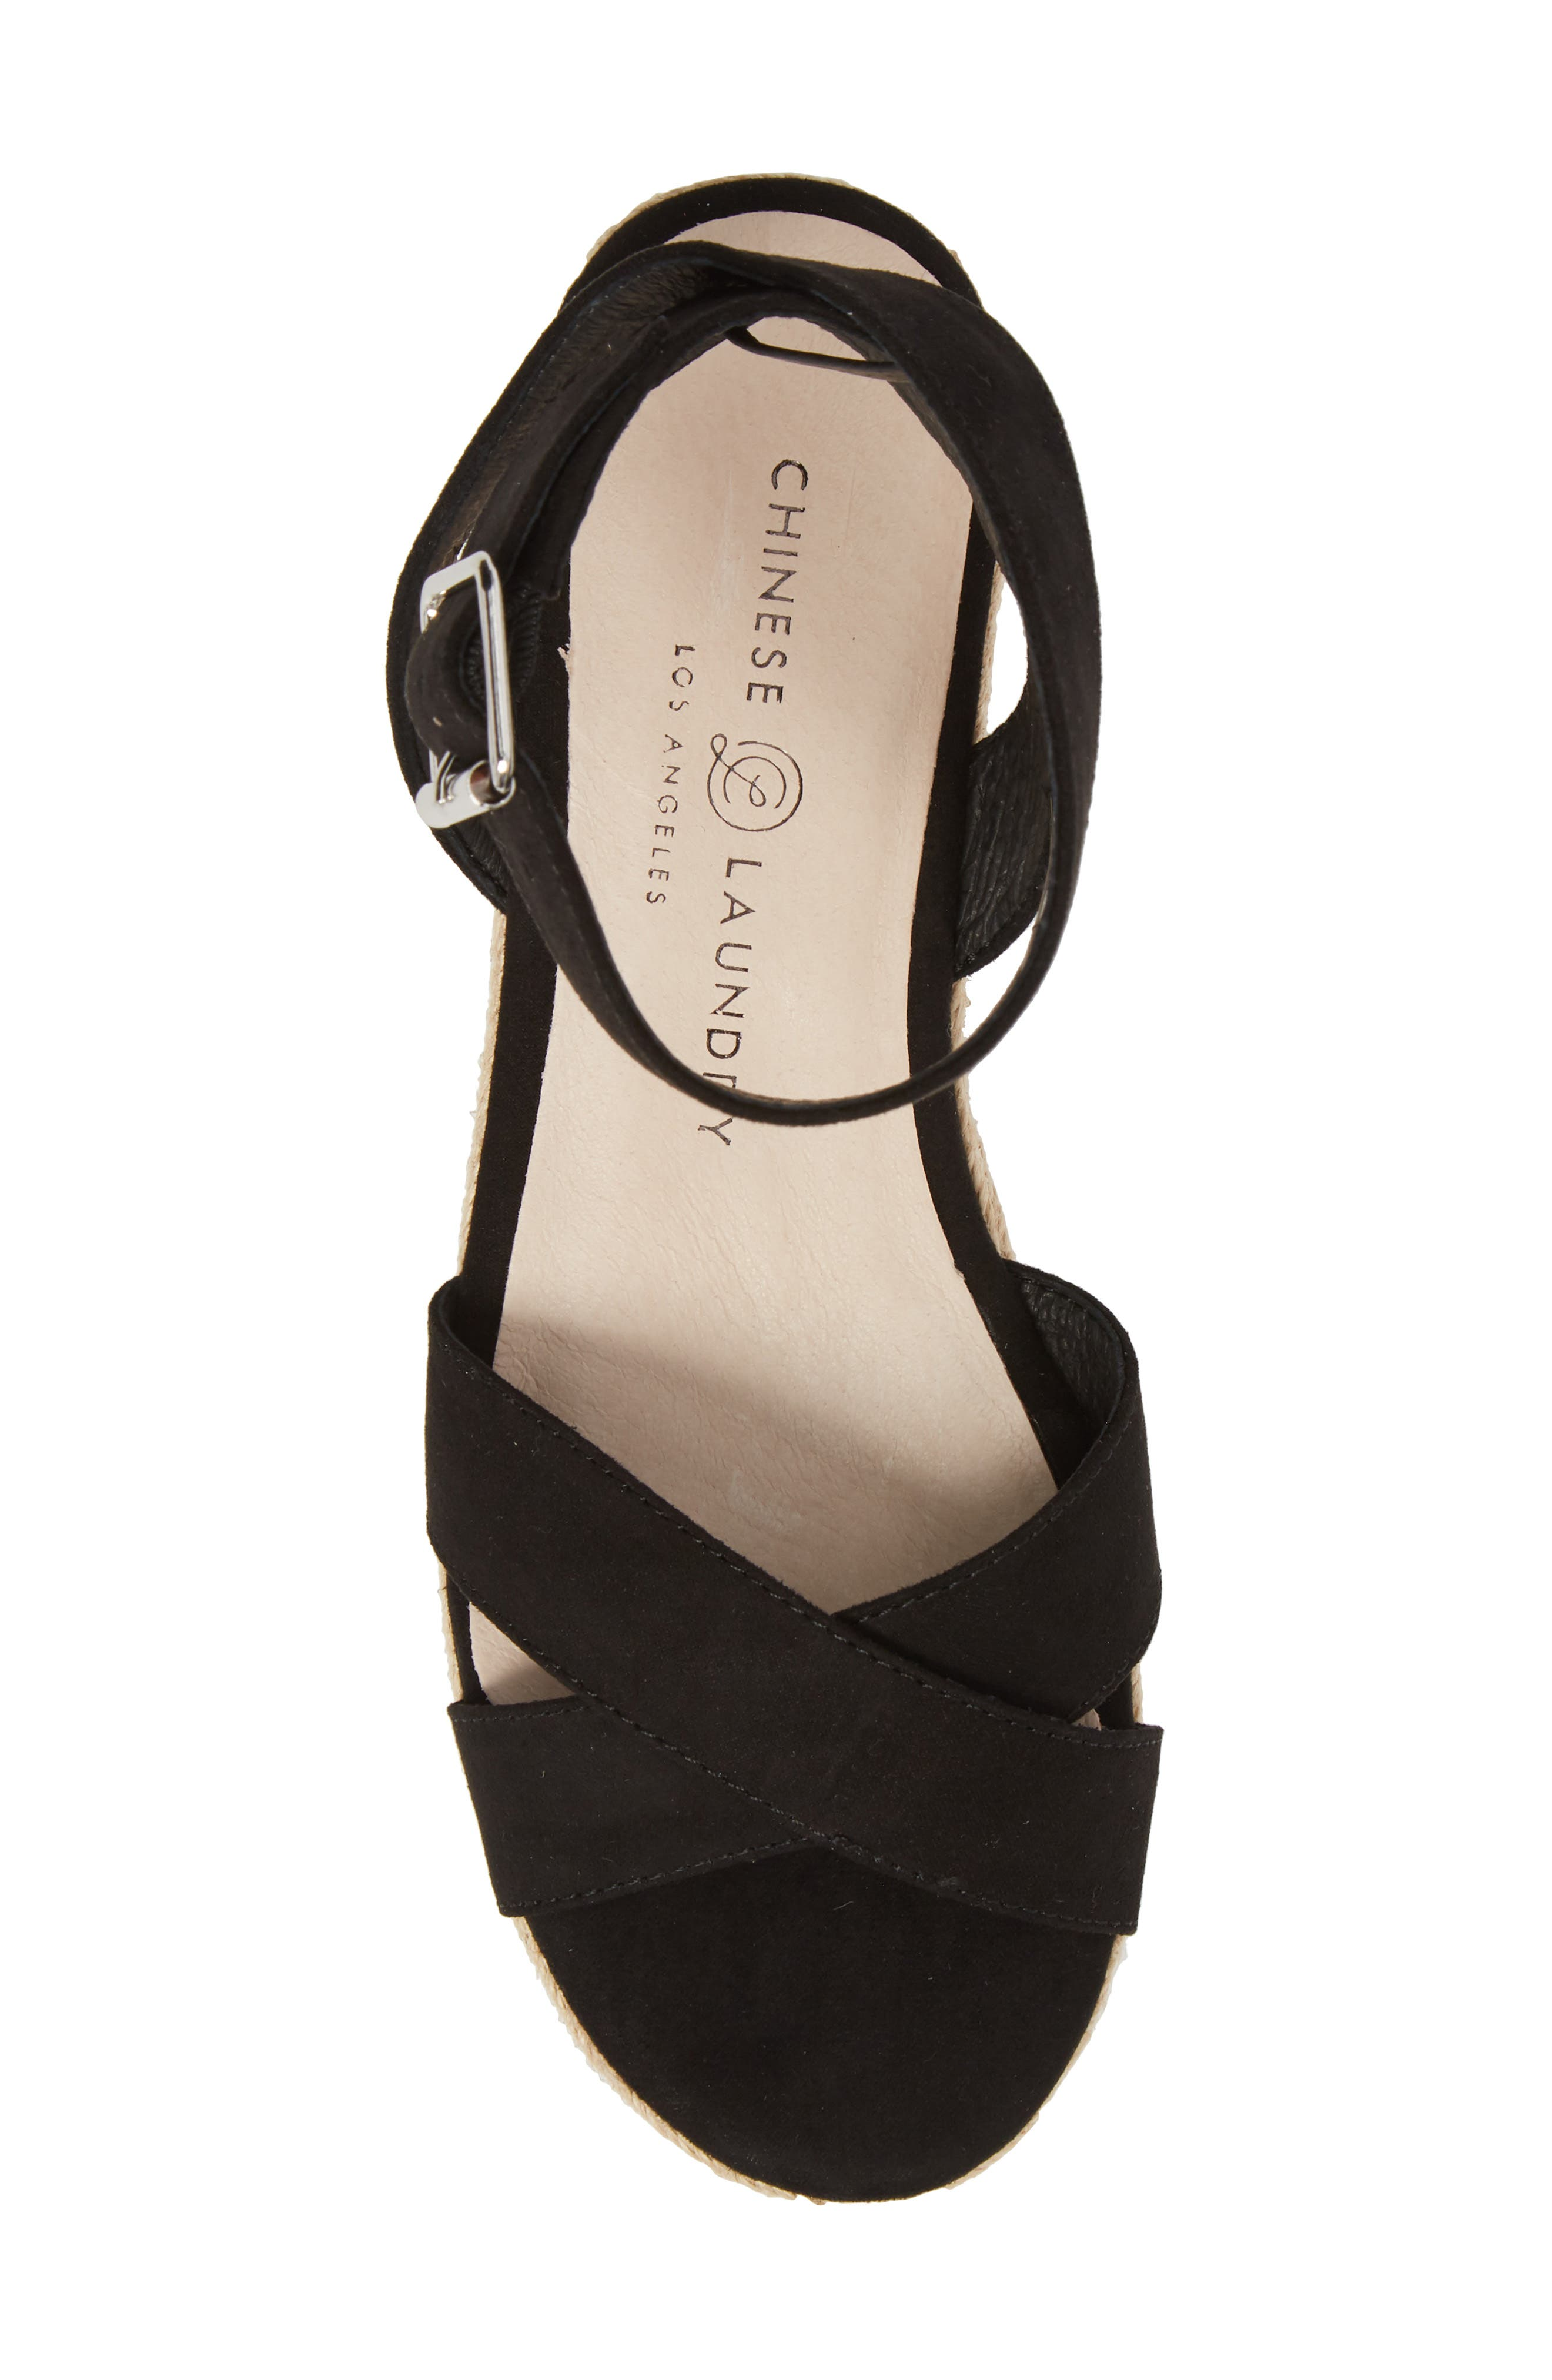 CHINESE LAUNDRY, Zala Espadrille Platform Sandal, Alternate thumbnail 5, color, BLACK